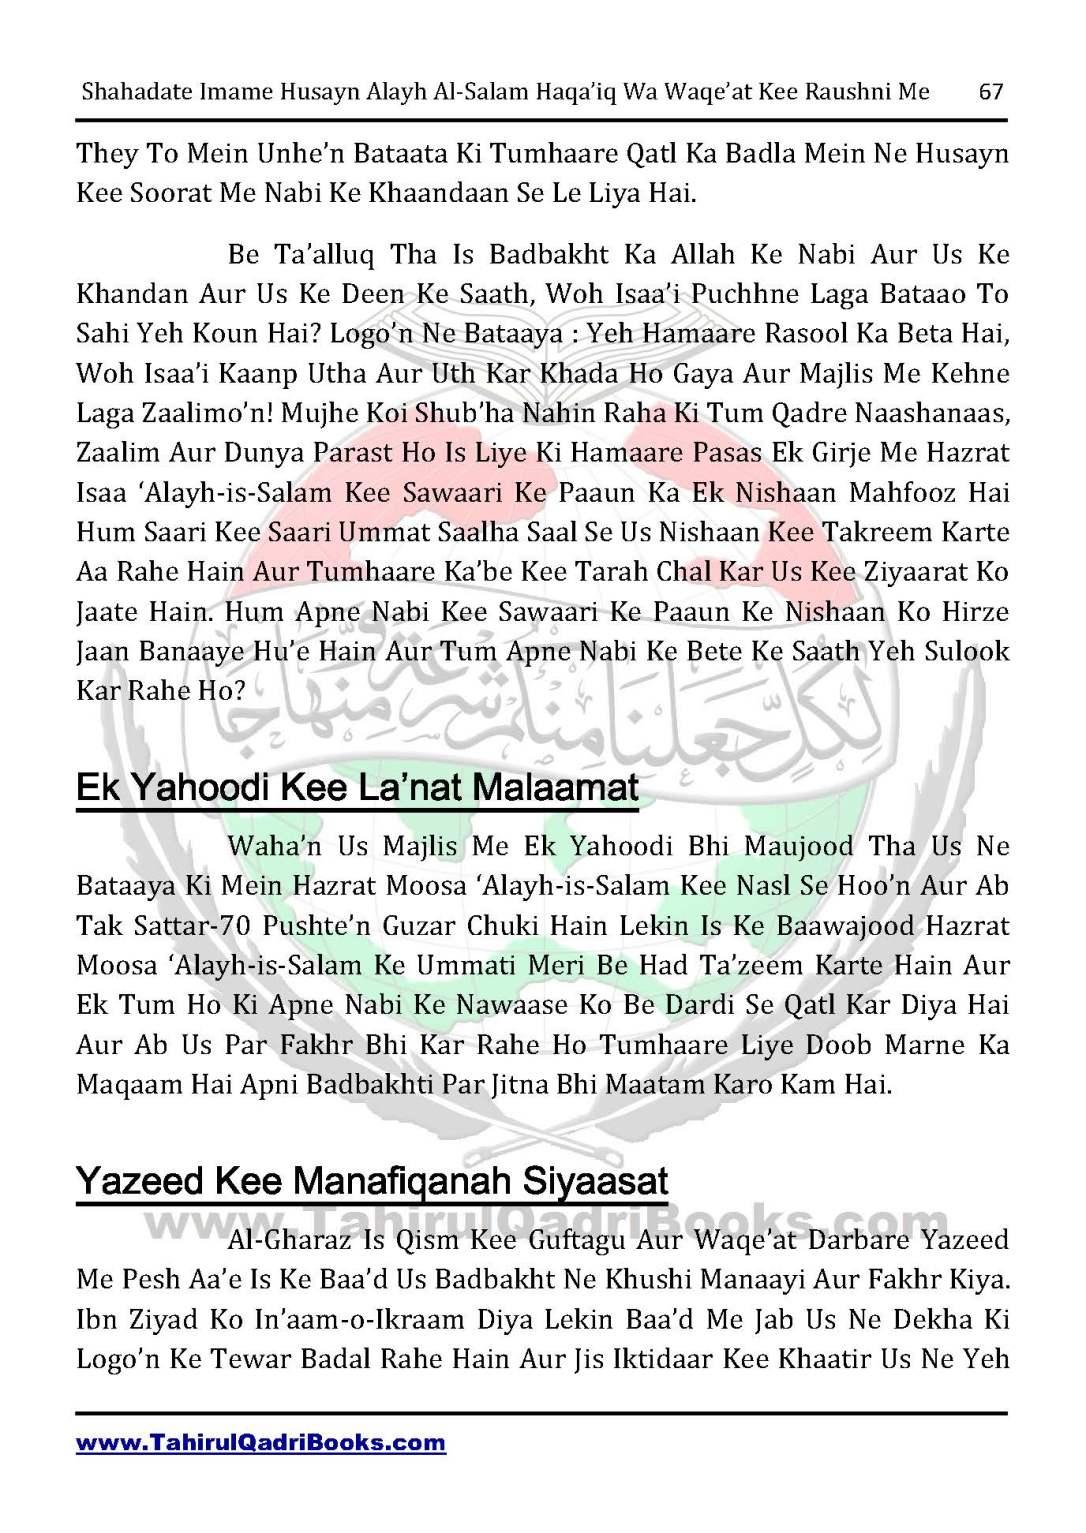 shahadate-imame-husayn-alayh-is-salam-haqaiq-wa-waqe_at-kee-raushni-me-in-roman-urdu-unlocked_Page_67